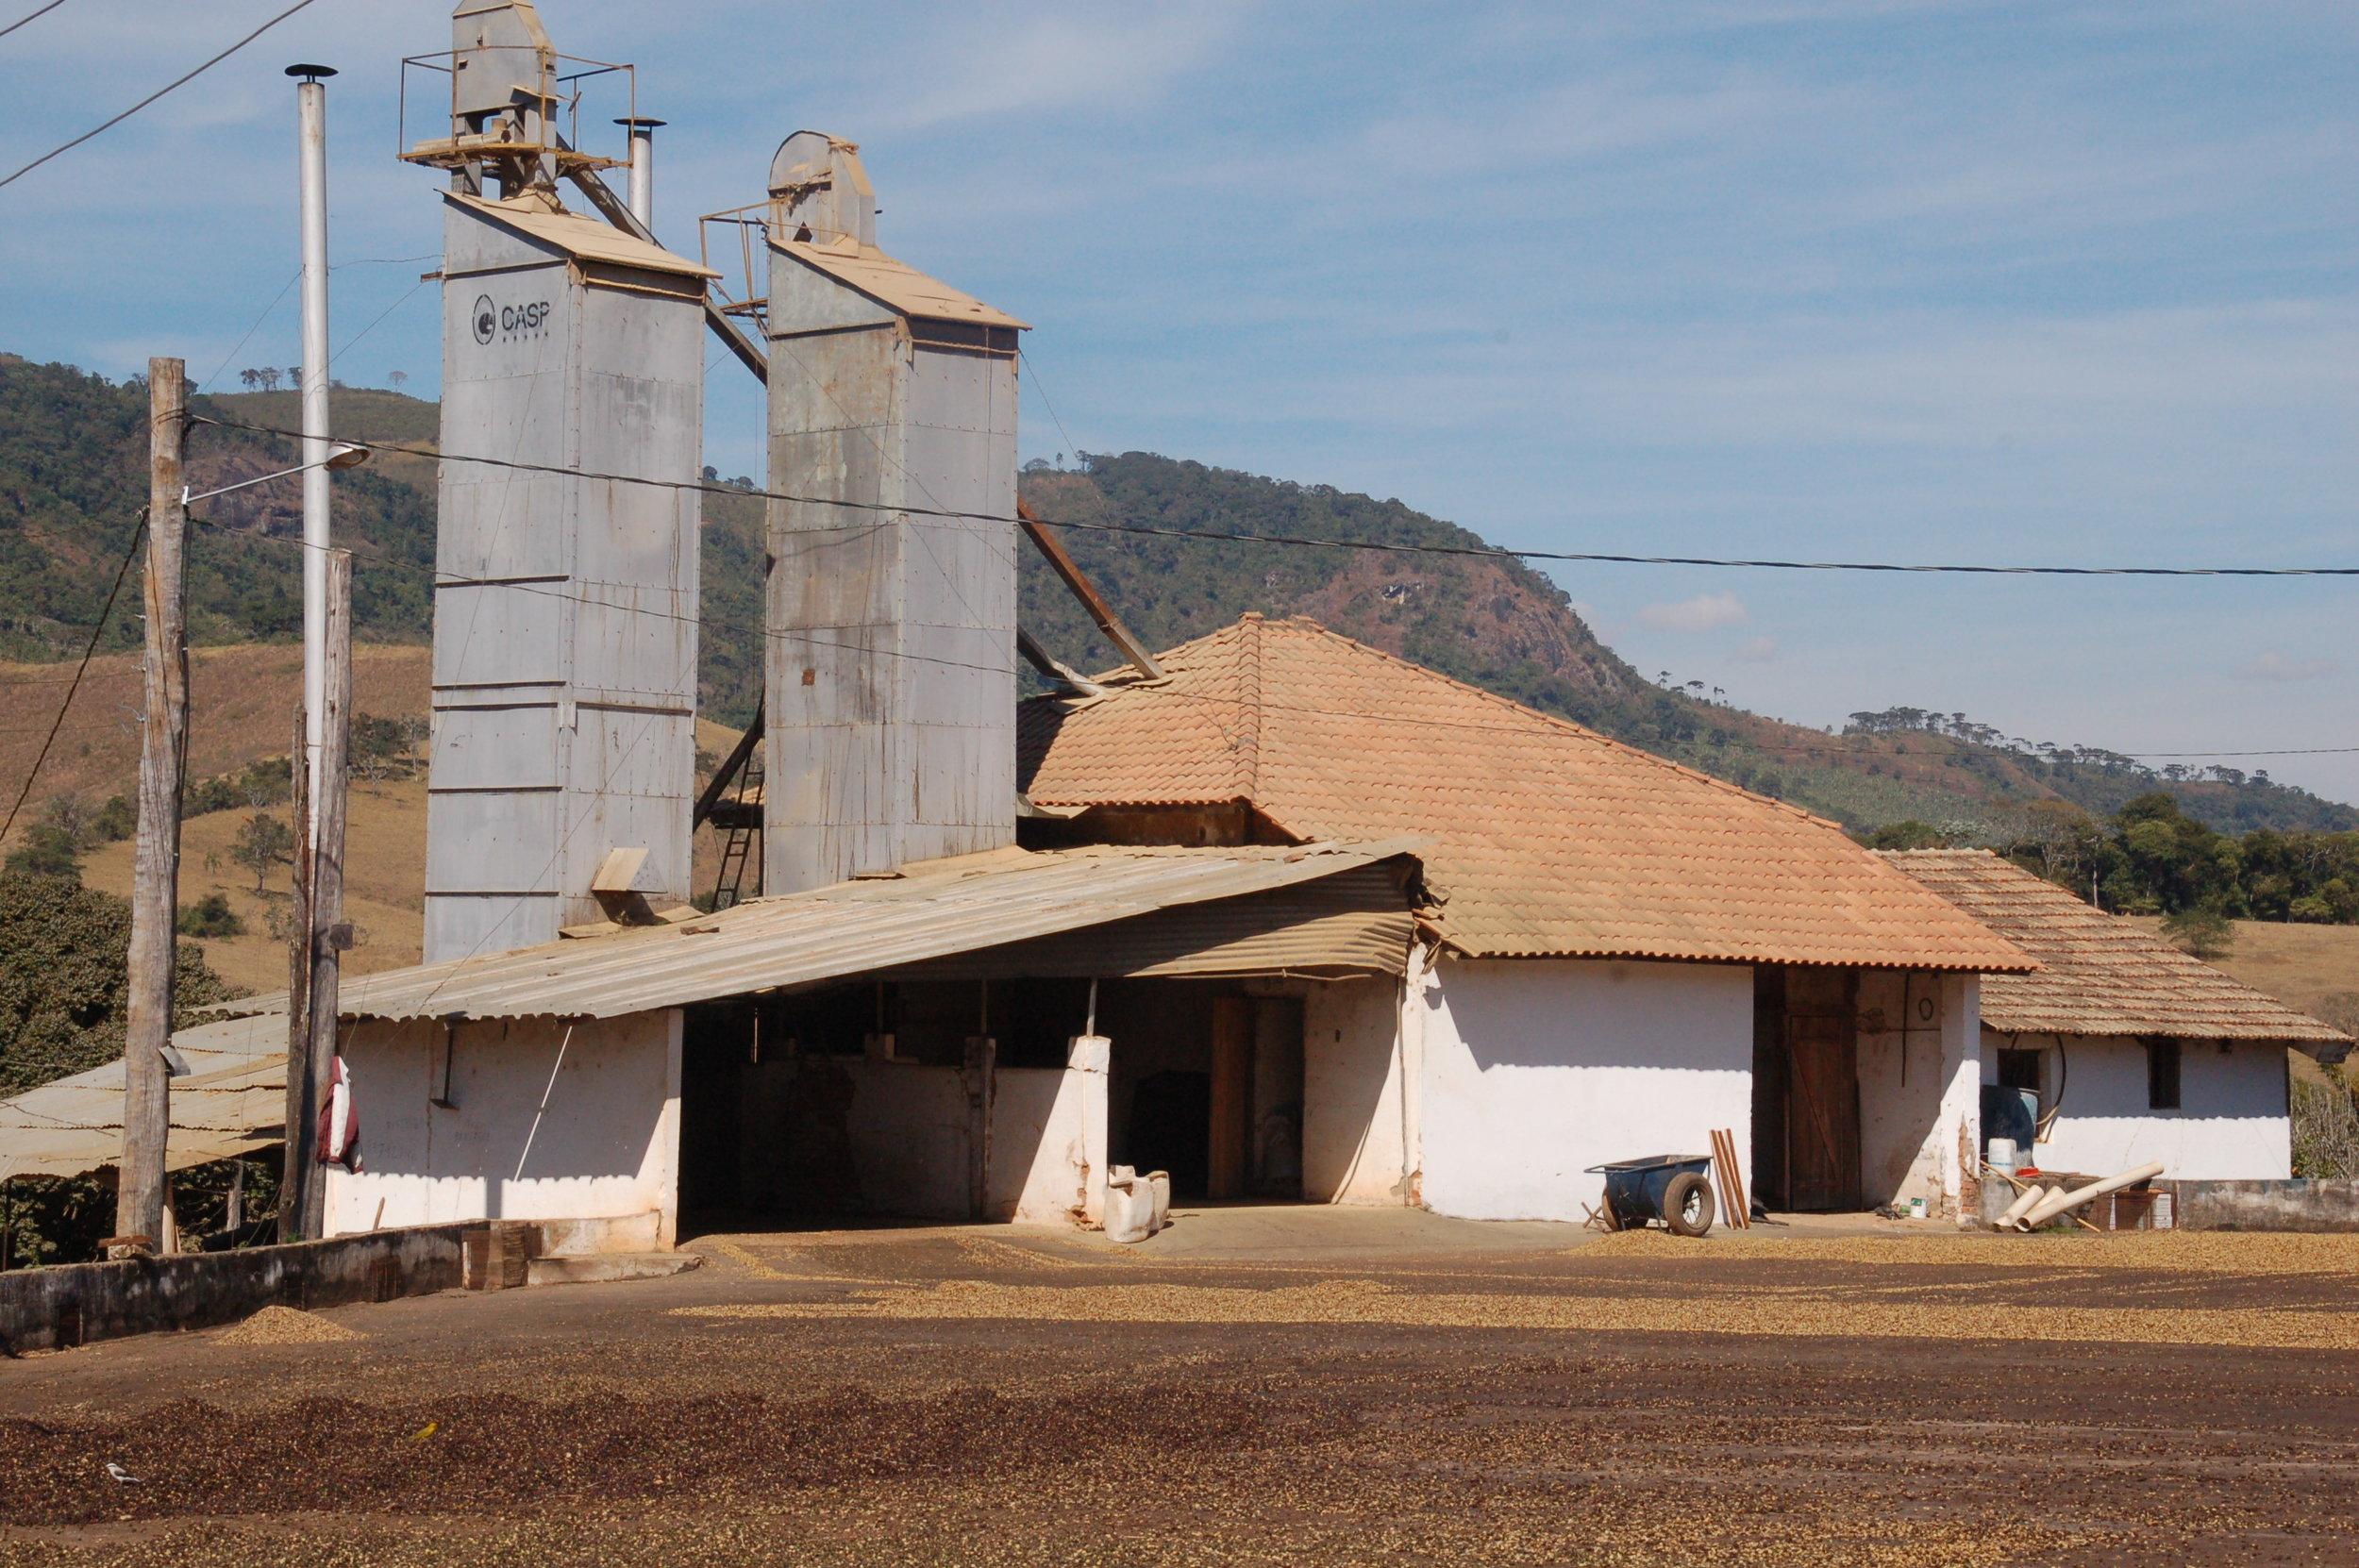 Fazenda Santa Ines (10)